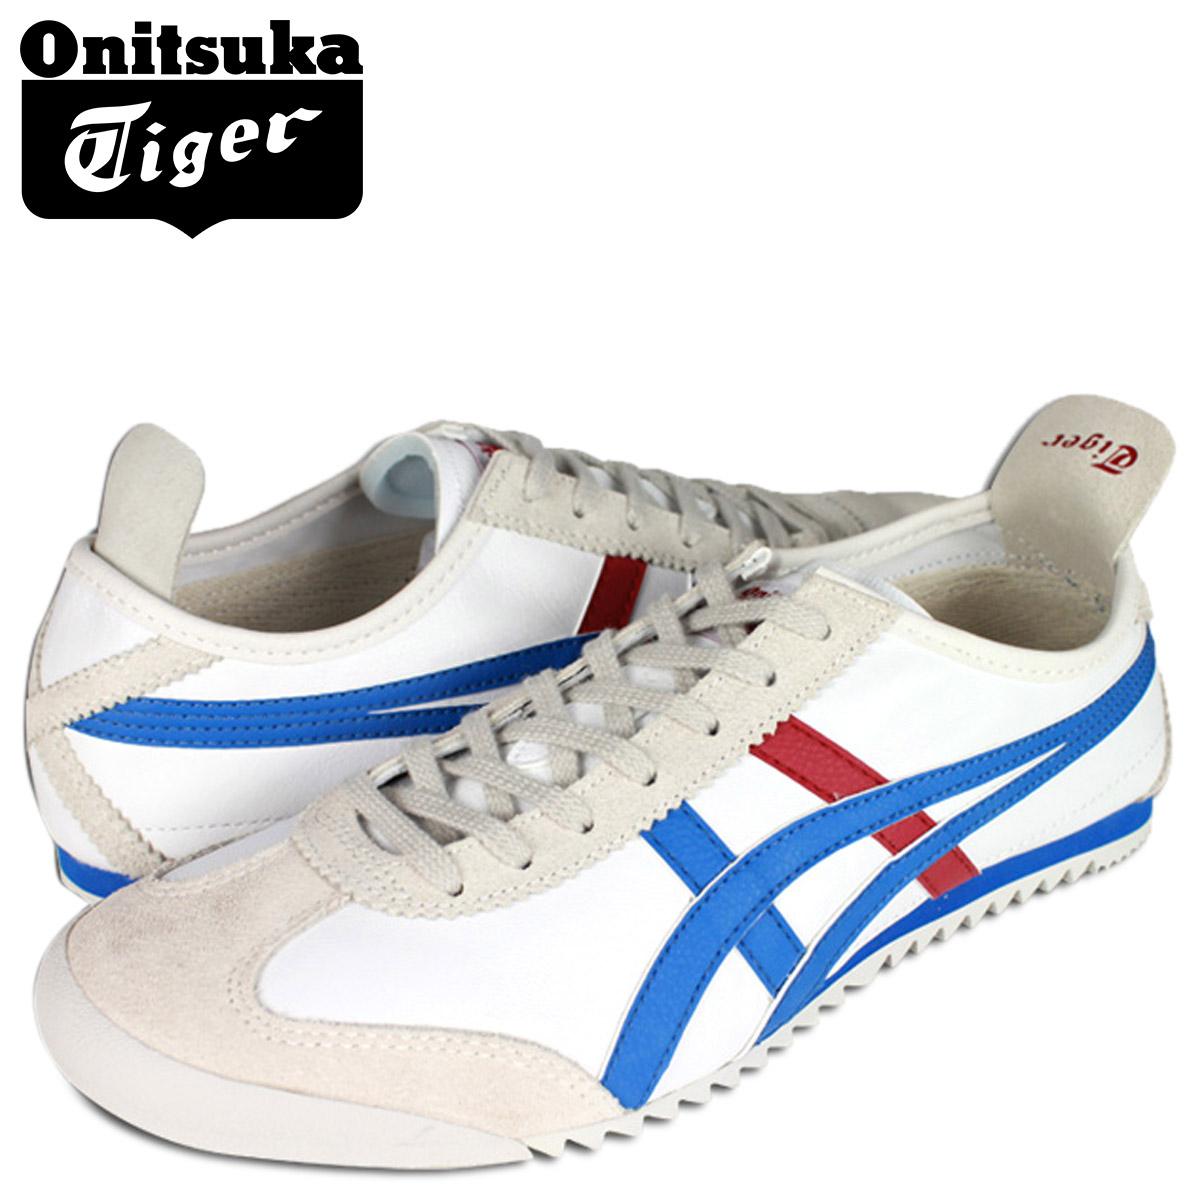 huippulaatua hieno muotoilu ostaa verkosta Onitsuka tiger ASICS Onitsuka Tiger asics sneakers white white royal blue  D012L-0143 MEXIC 66 DX LE men